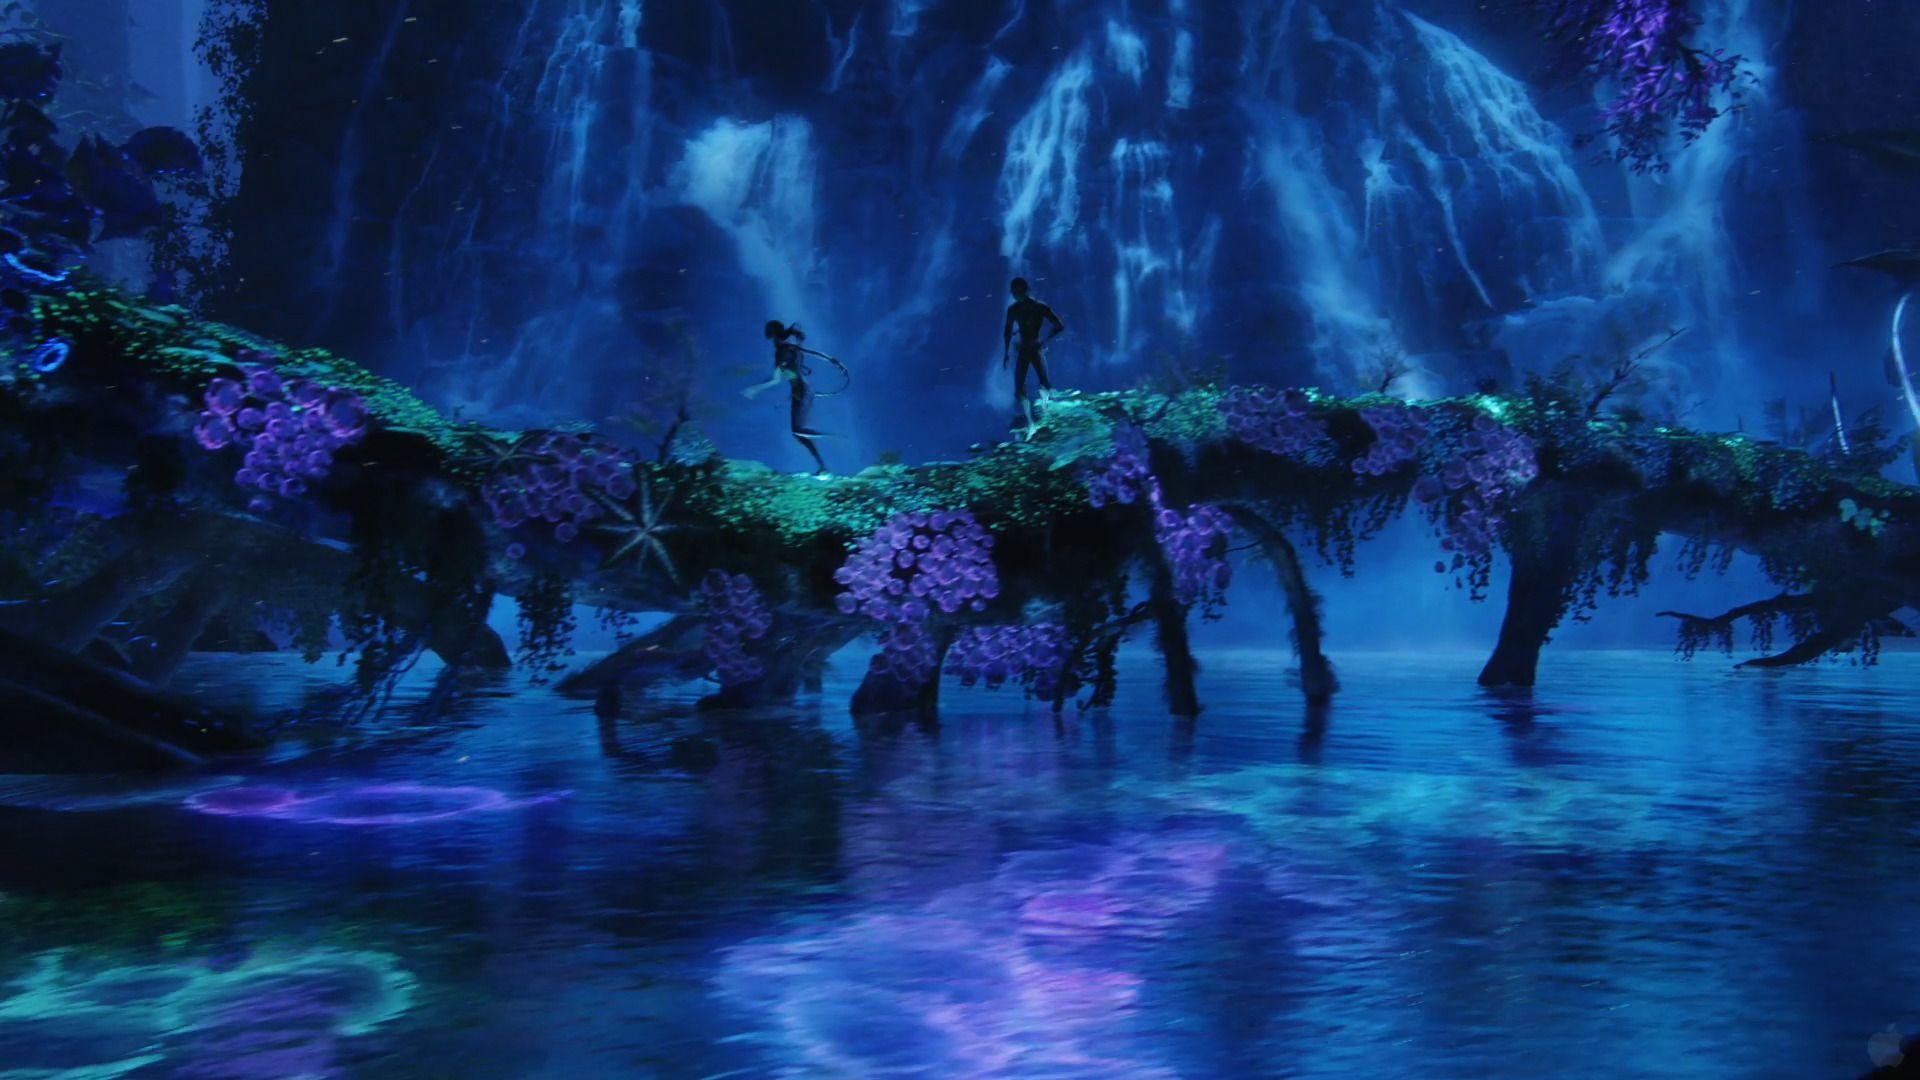 pandora Blue Lagoon from Avatar wallpaper Click